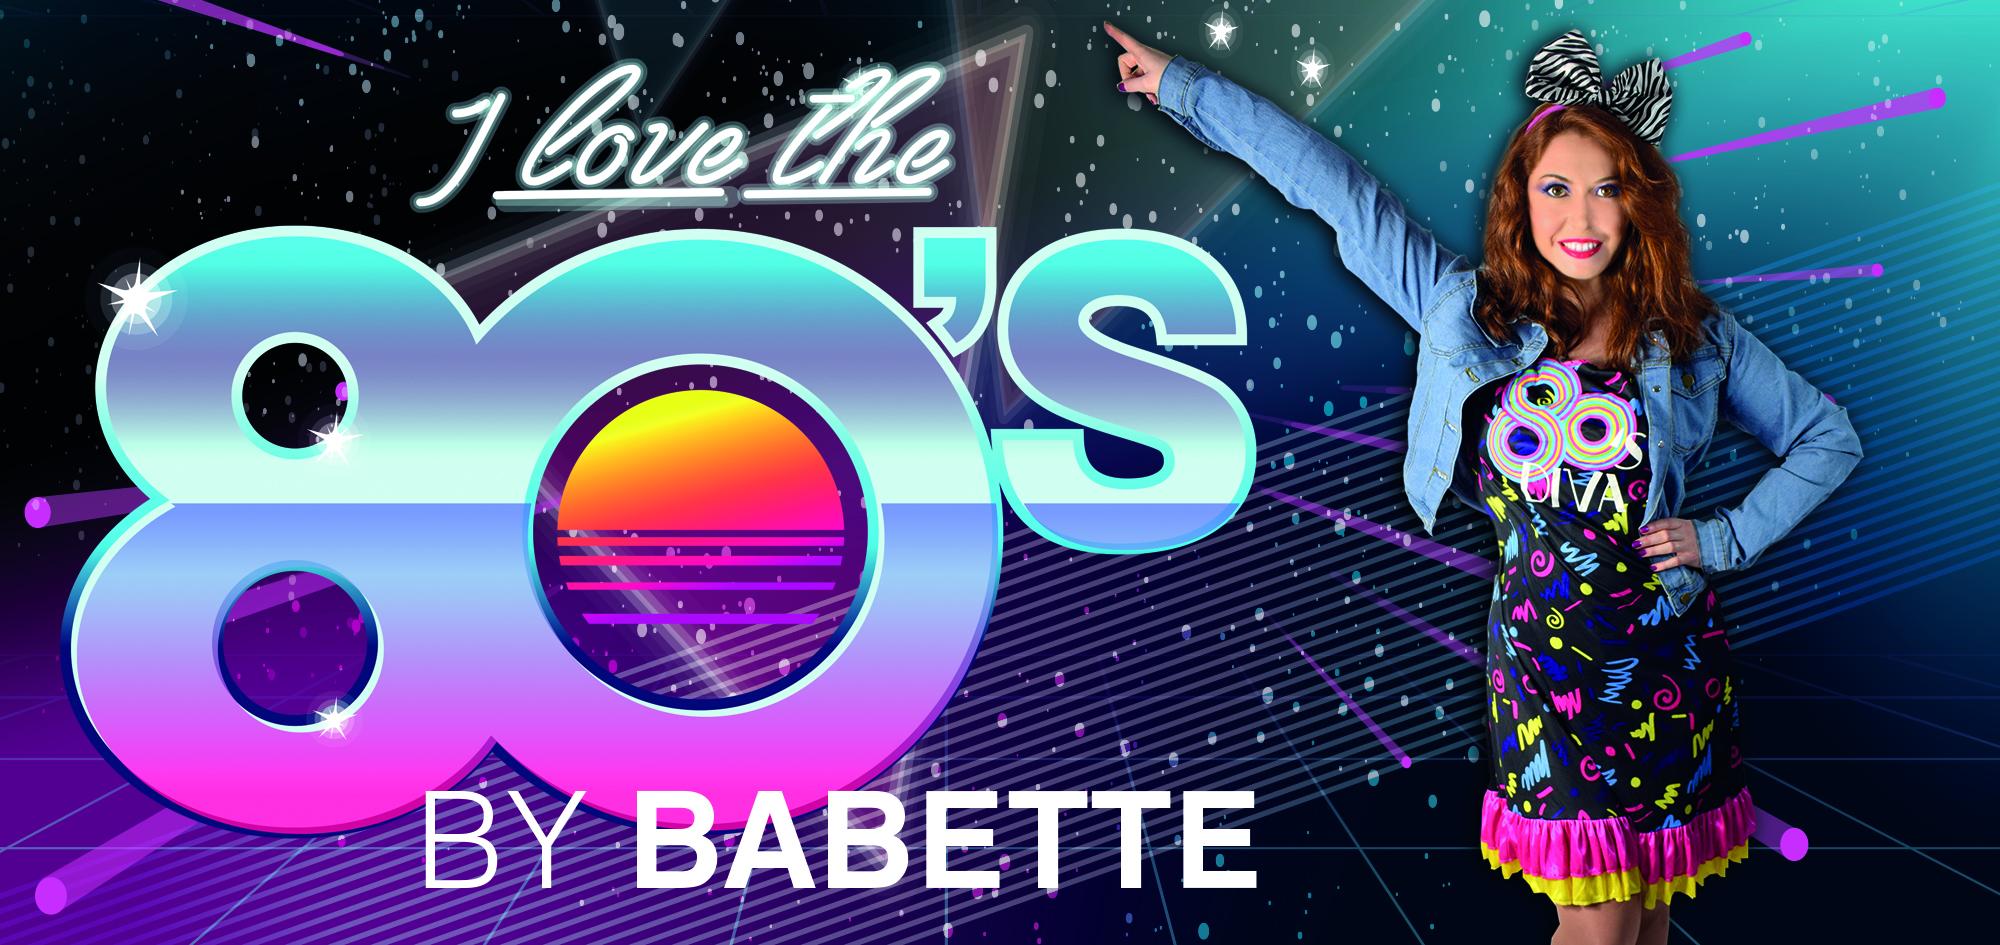 80s banner